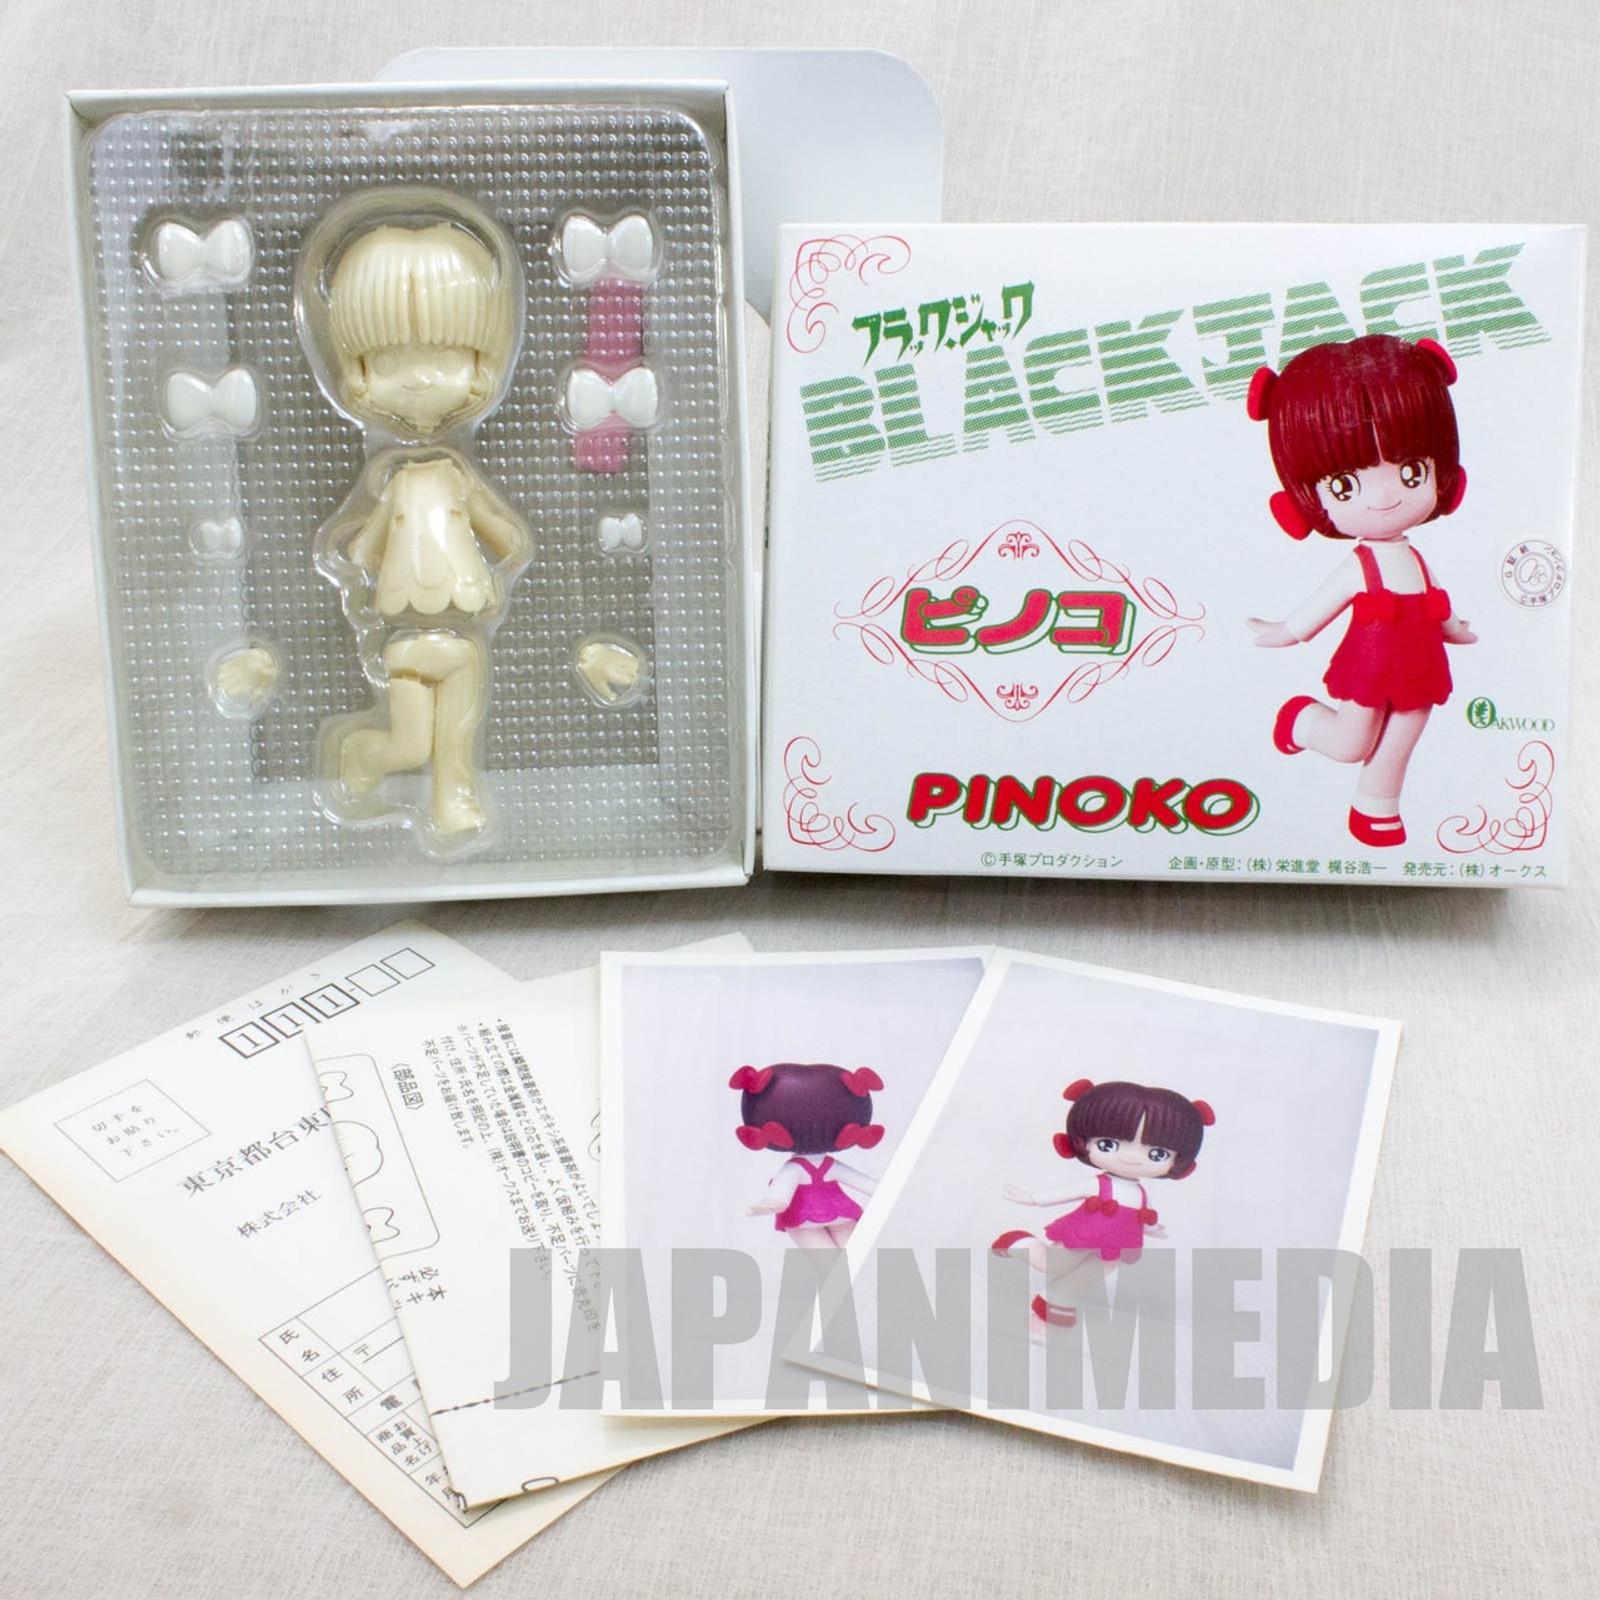 Black Jack Pinoko Resin Model Kit Osamu Tezuka Tsukuda Hobby JAPAN ANIME